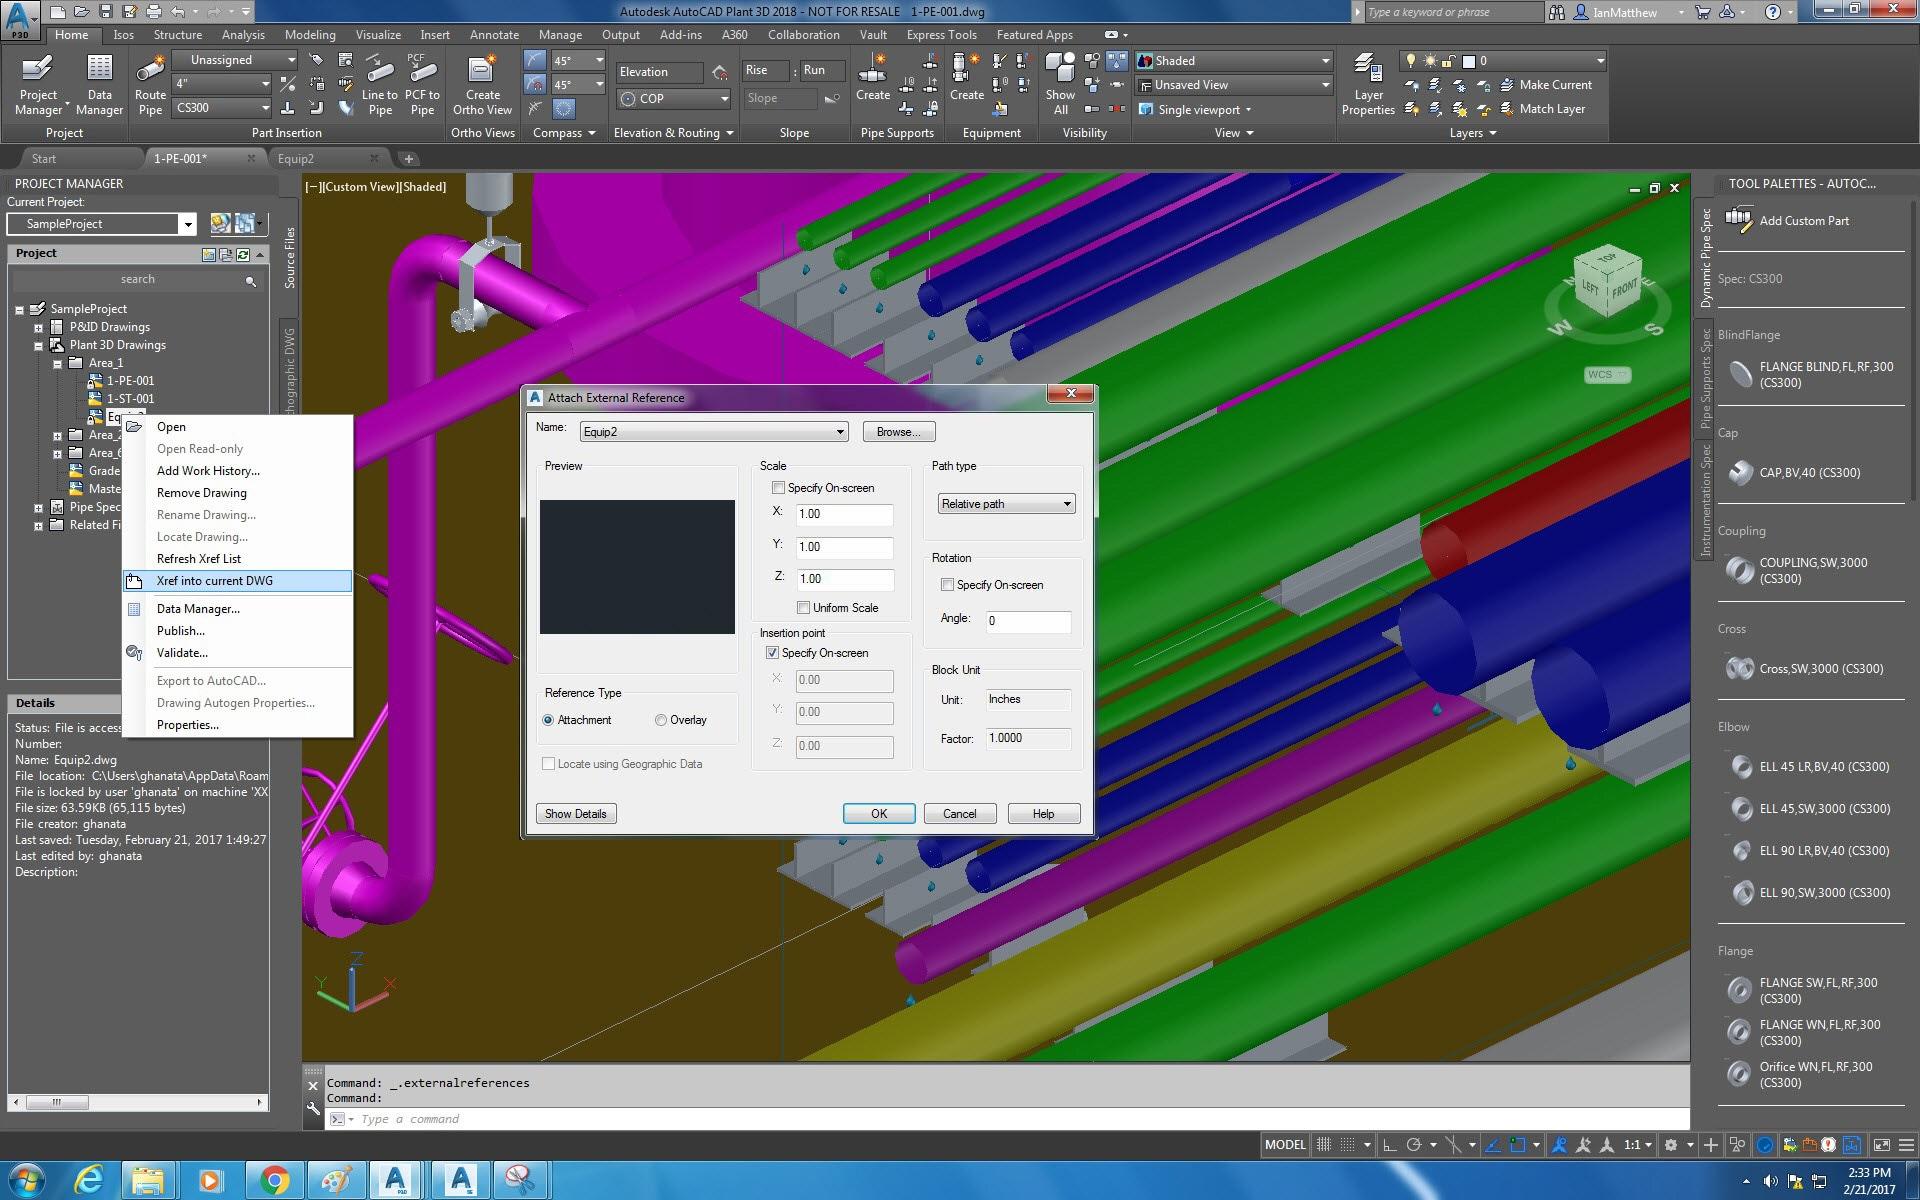 Autocad Plant 3d Toolset Design Software Piping Instrumentation Diagram P Id Tutorial Integration With Vault Data Management